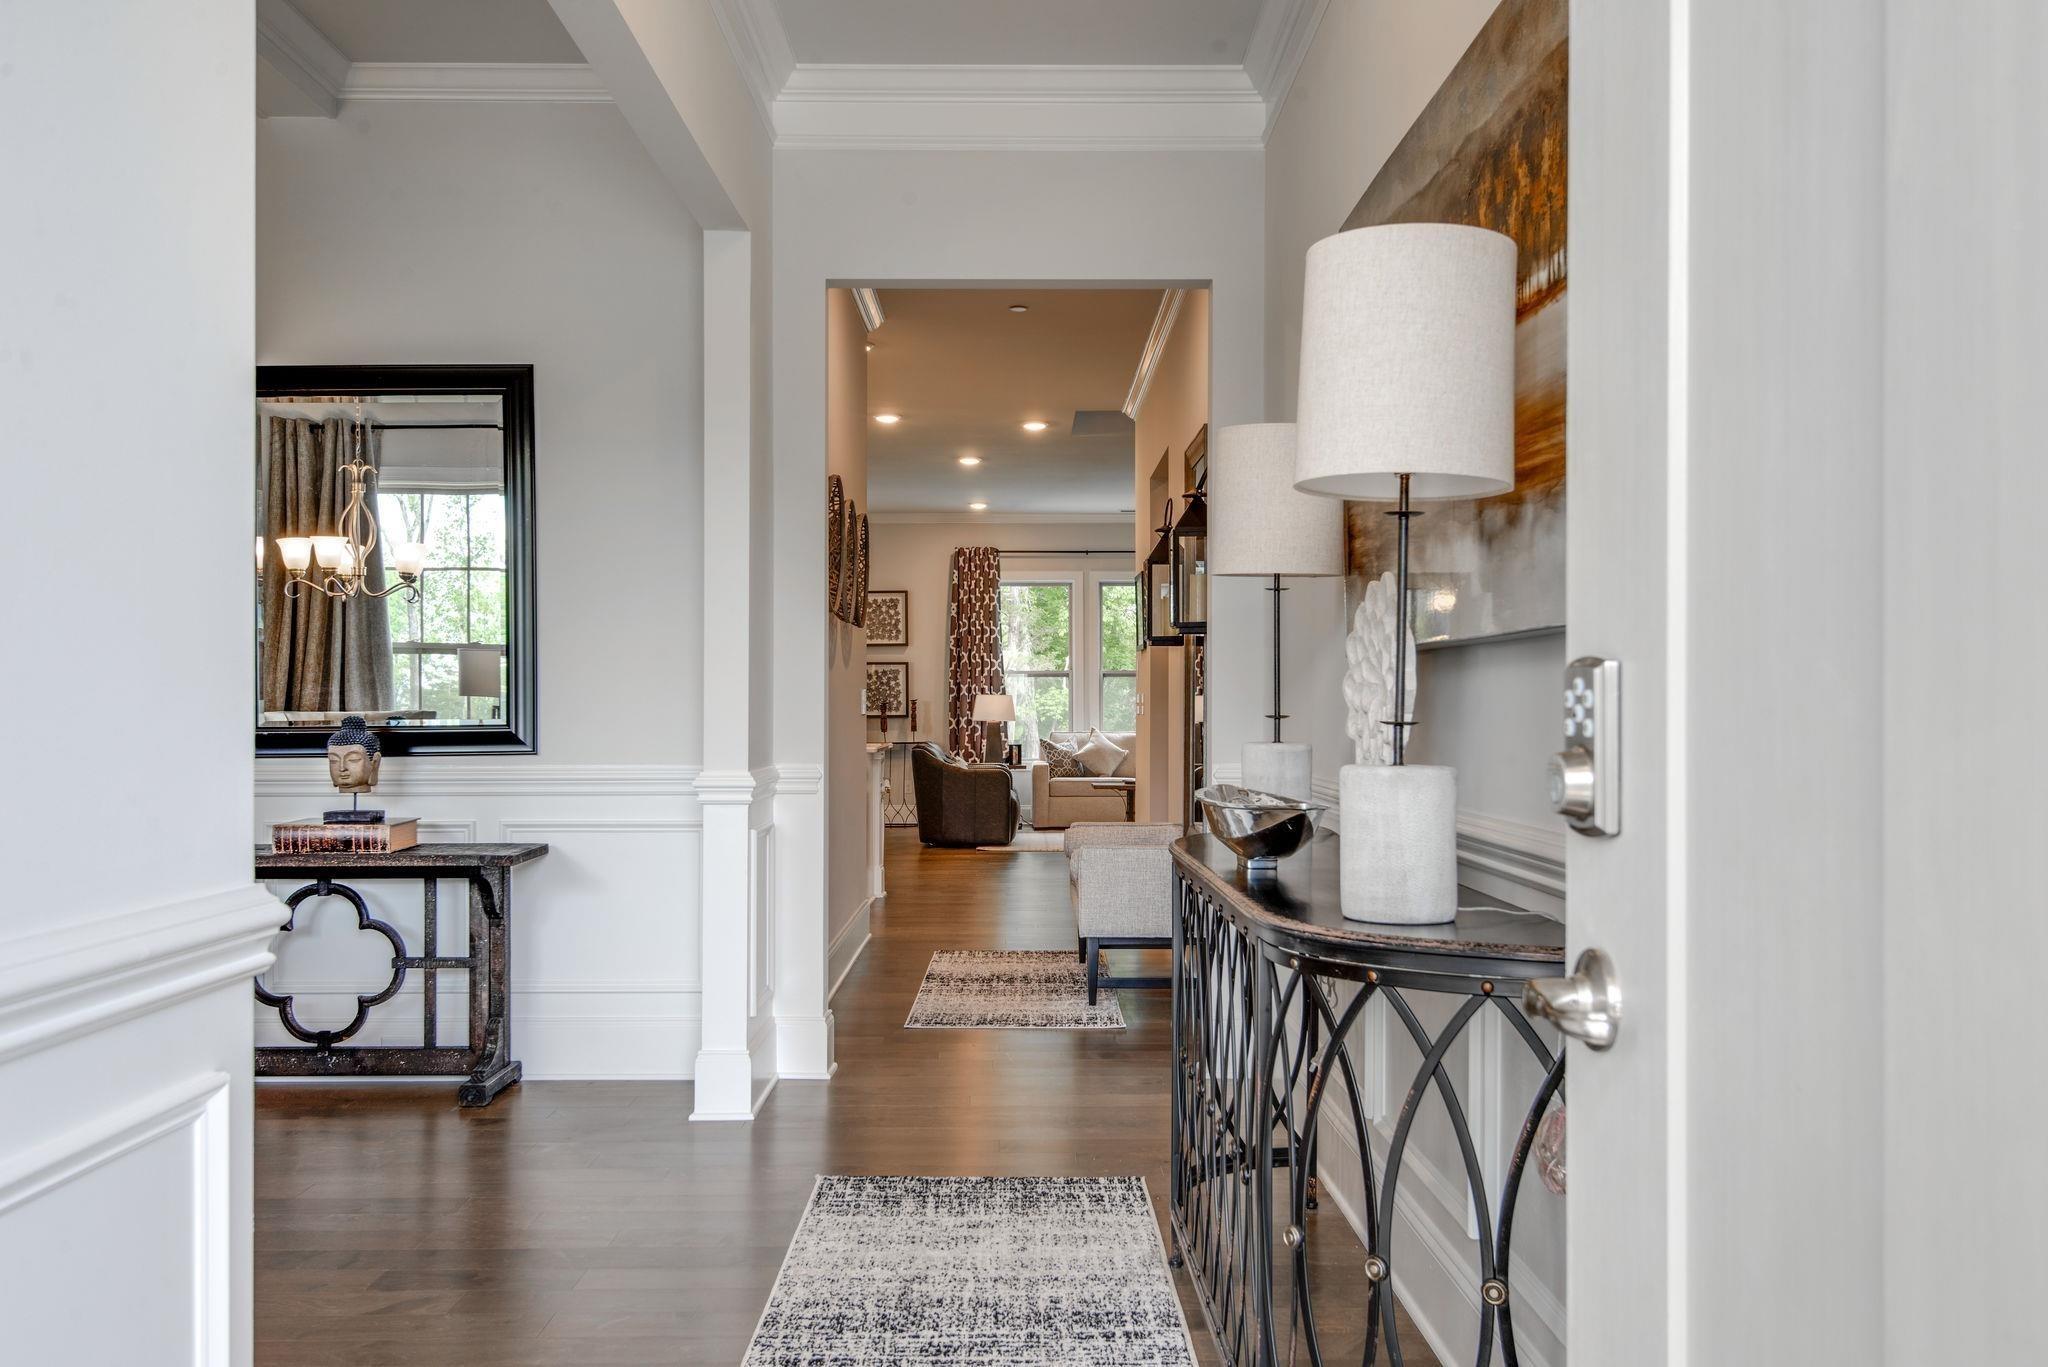 937 Los Lomas Lot #65, Nolensville, TN 37135 - Nolensville, TN real estate listing